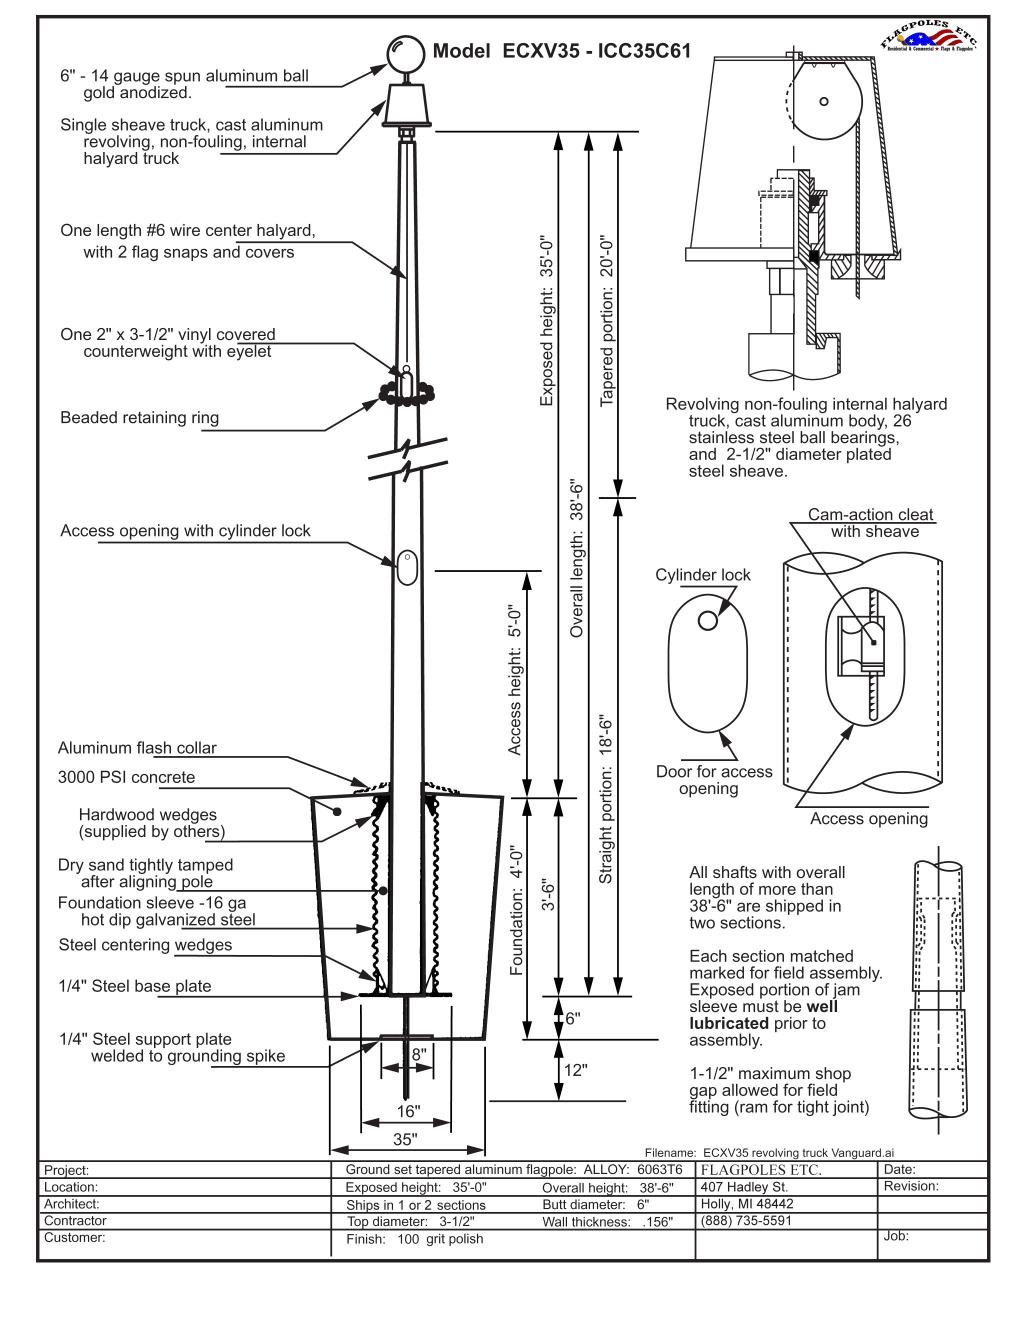 35 Ft Aluminum Flagpole 35 X 6 X 156 Internal